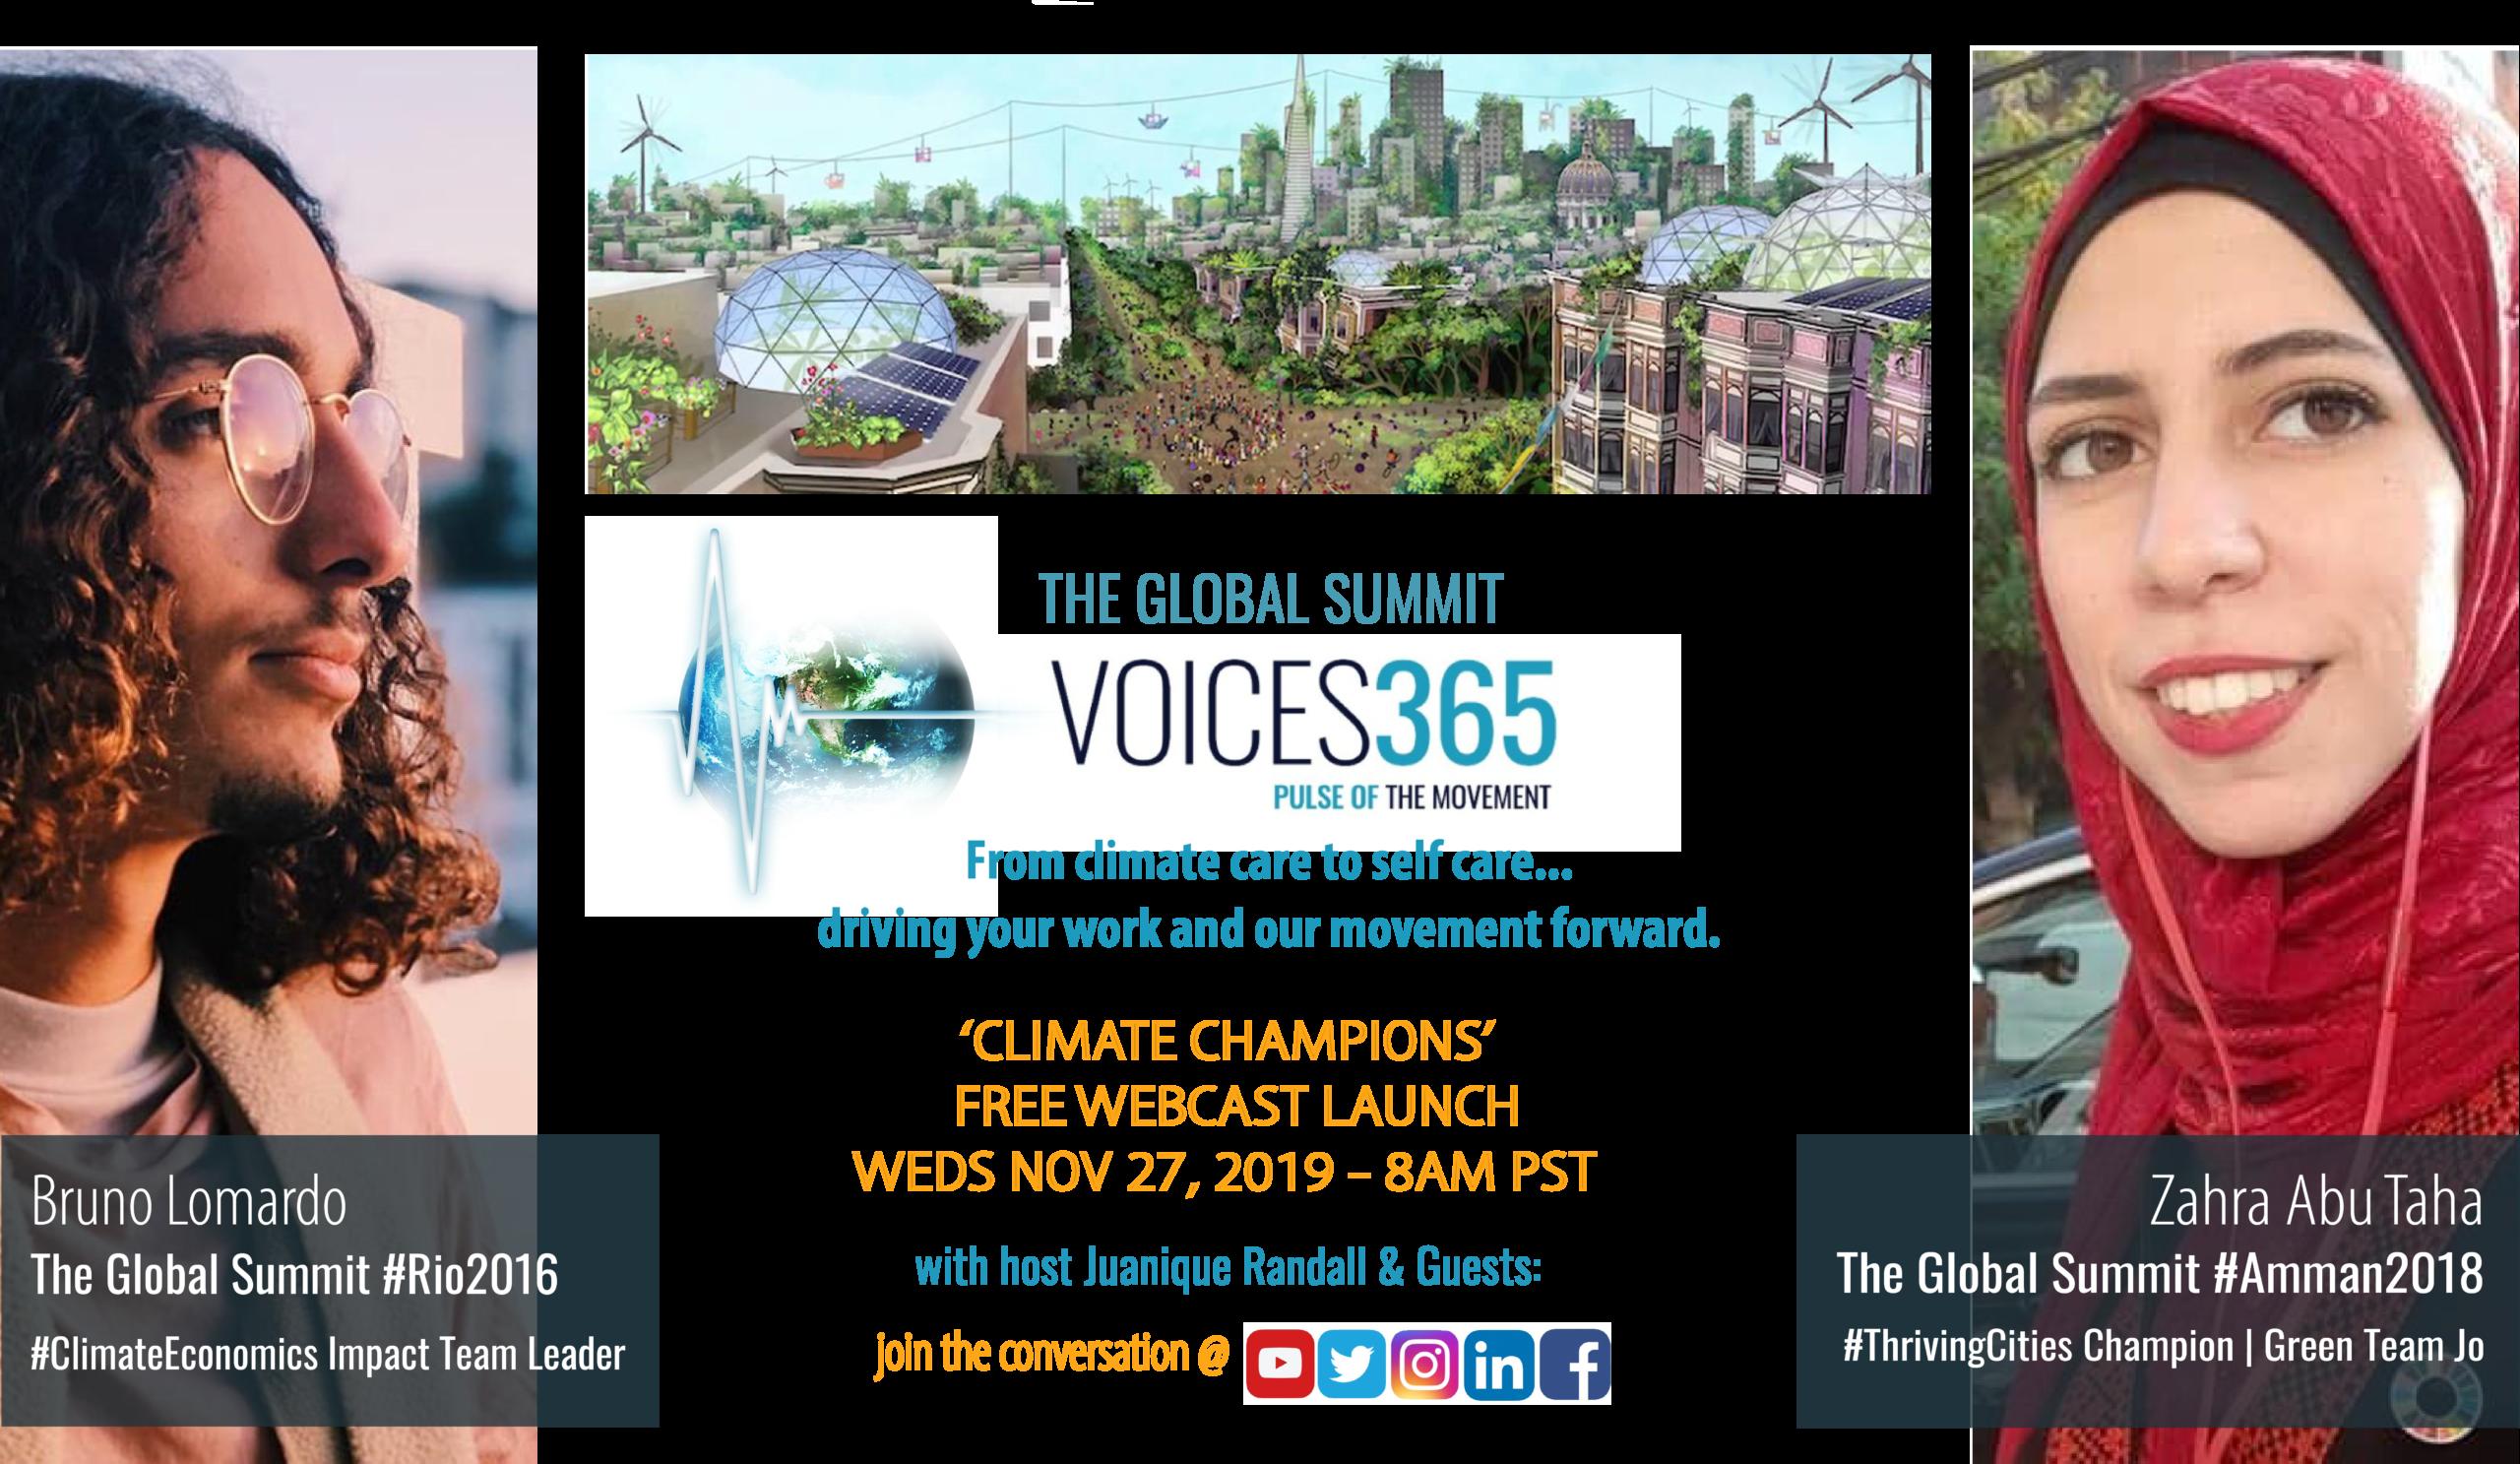 Climate Champions Webcast Launch